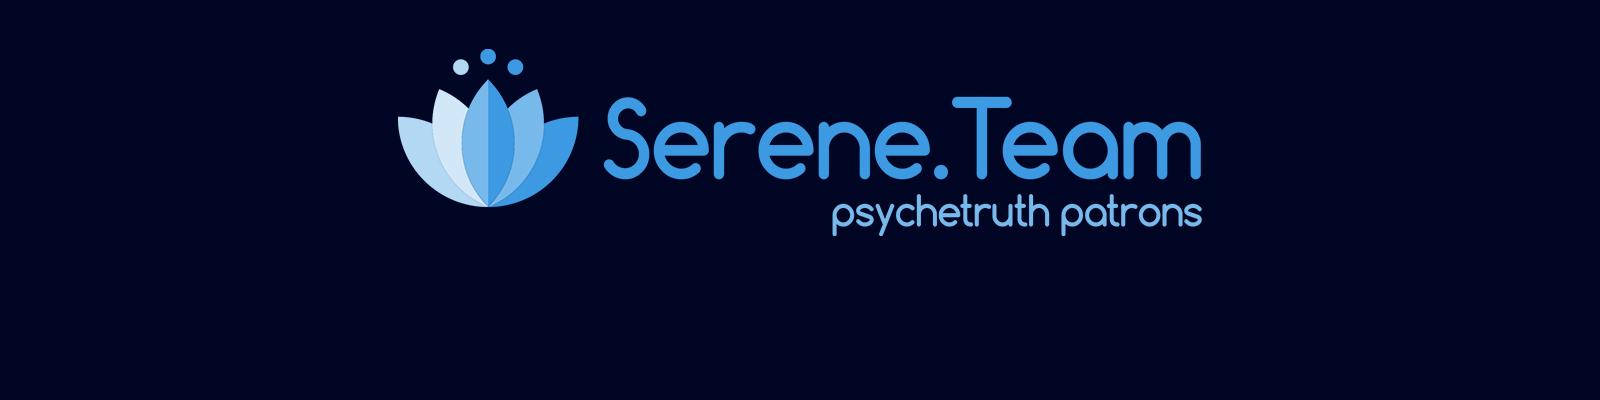 Serene Team